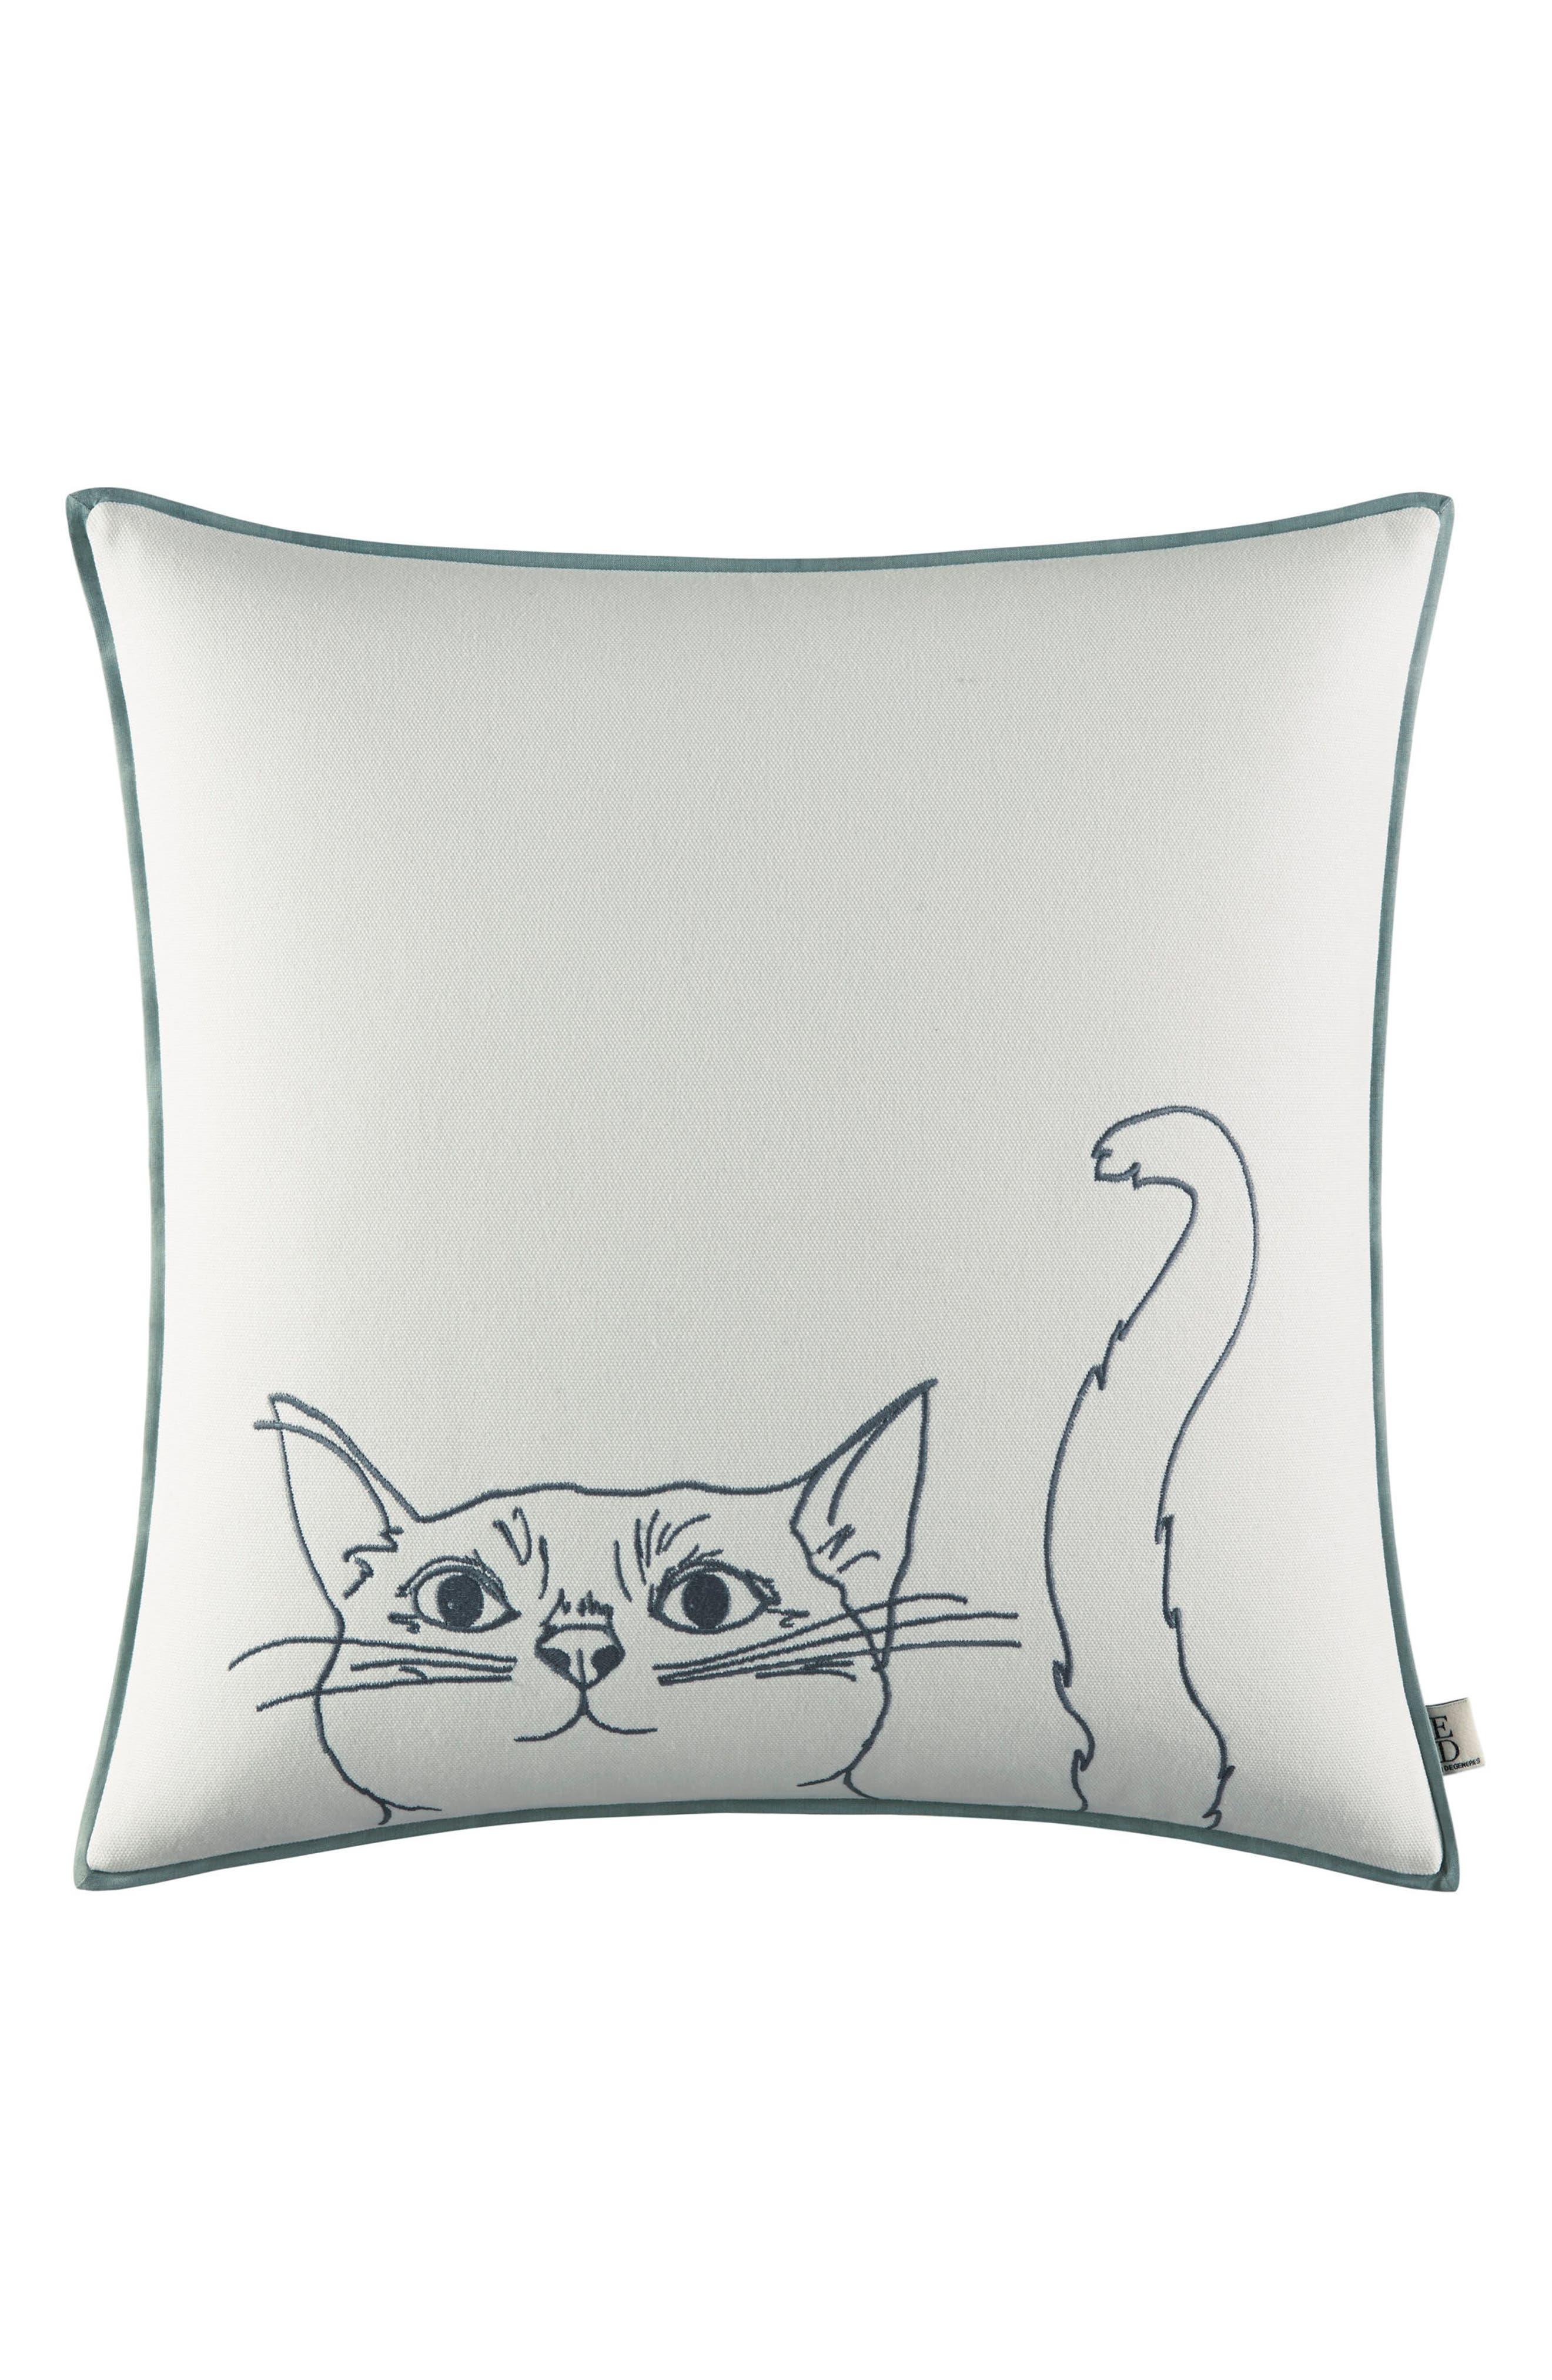 Cat Pillow,                         Main,                         color, 115